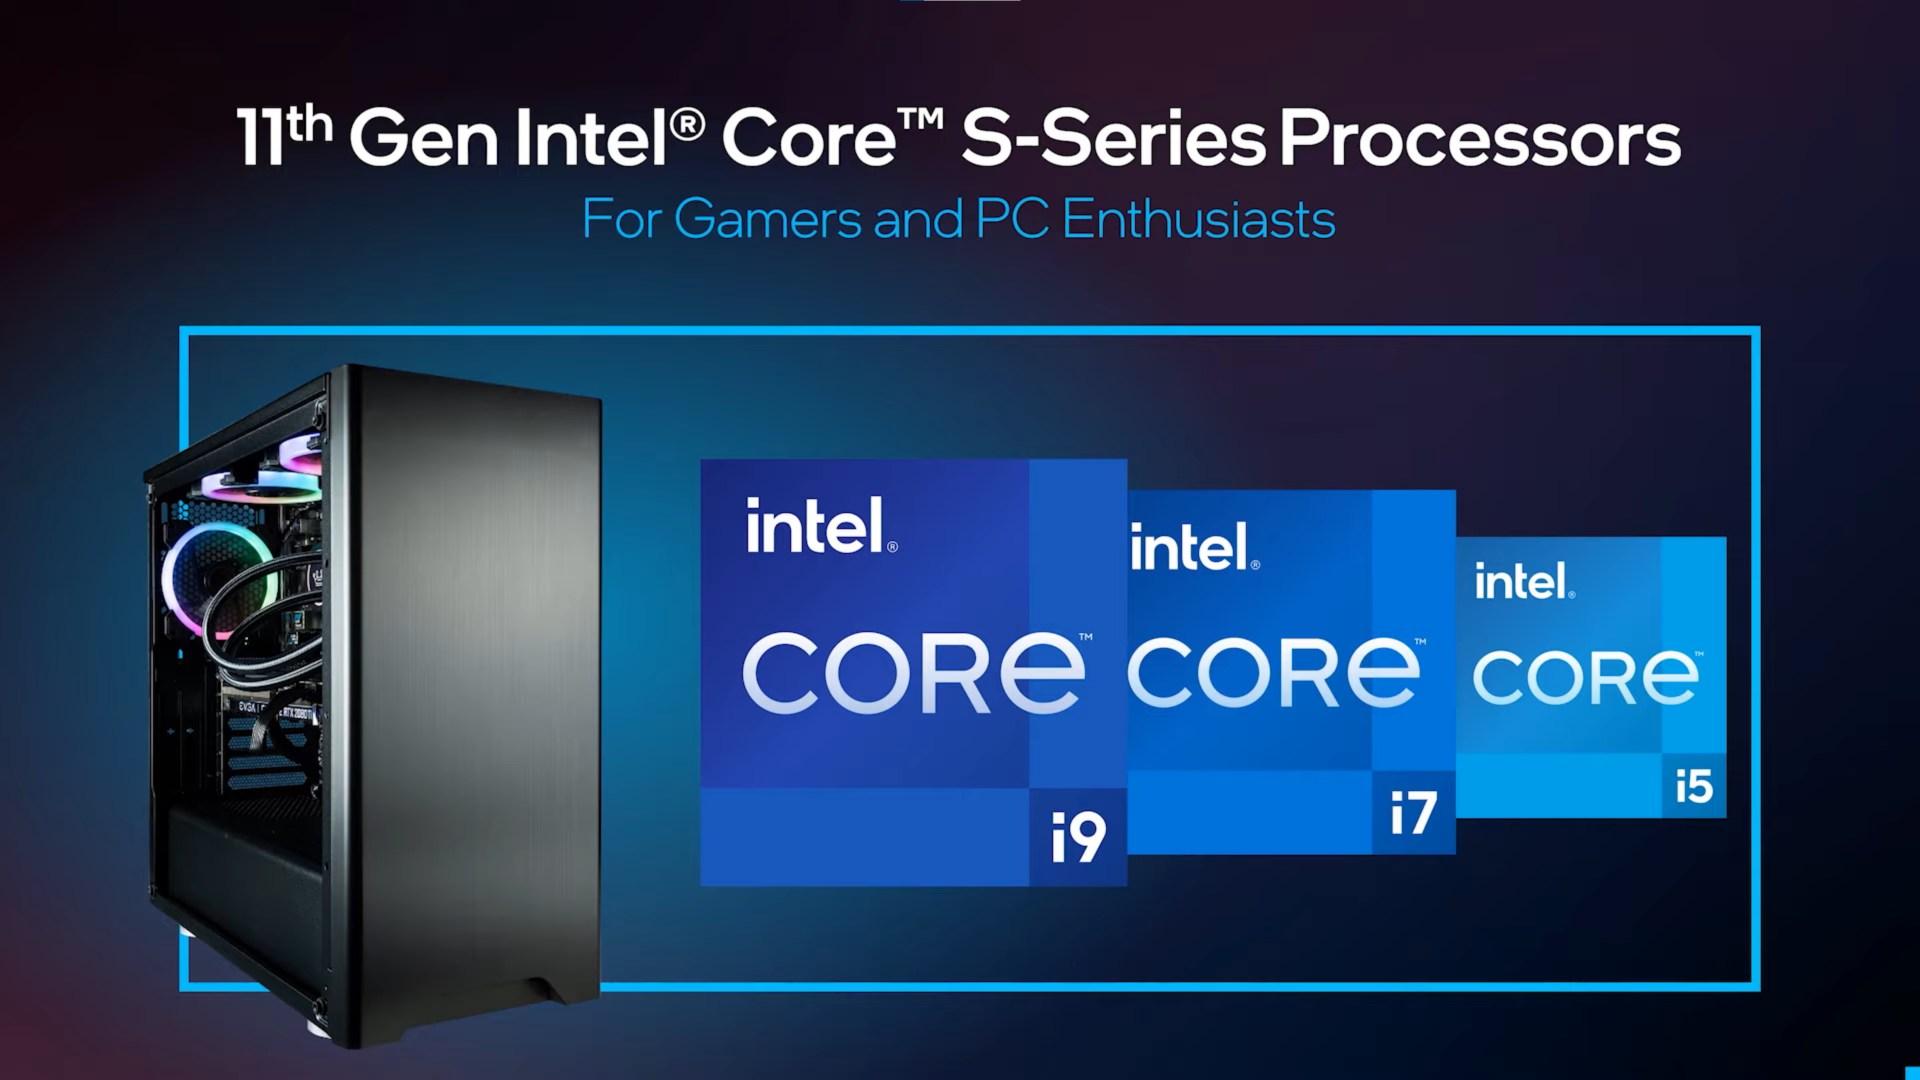 Intel, Prozessor, Cpu, Chip, Octacore, SoC, Intel Xe, Chipsatz, Rocket Lake, Rocket Lake S, Chipset, 14 nm, Intel 500 Series